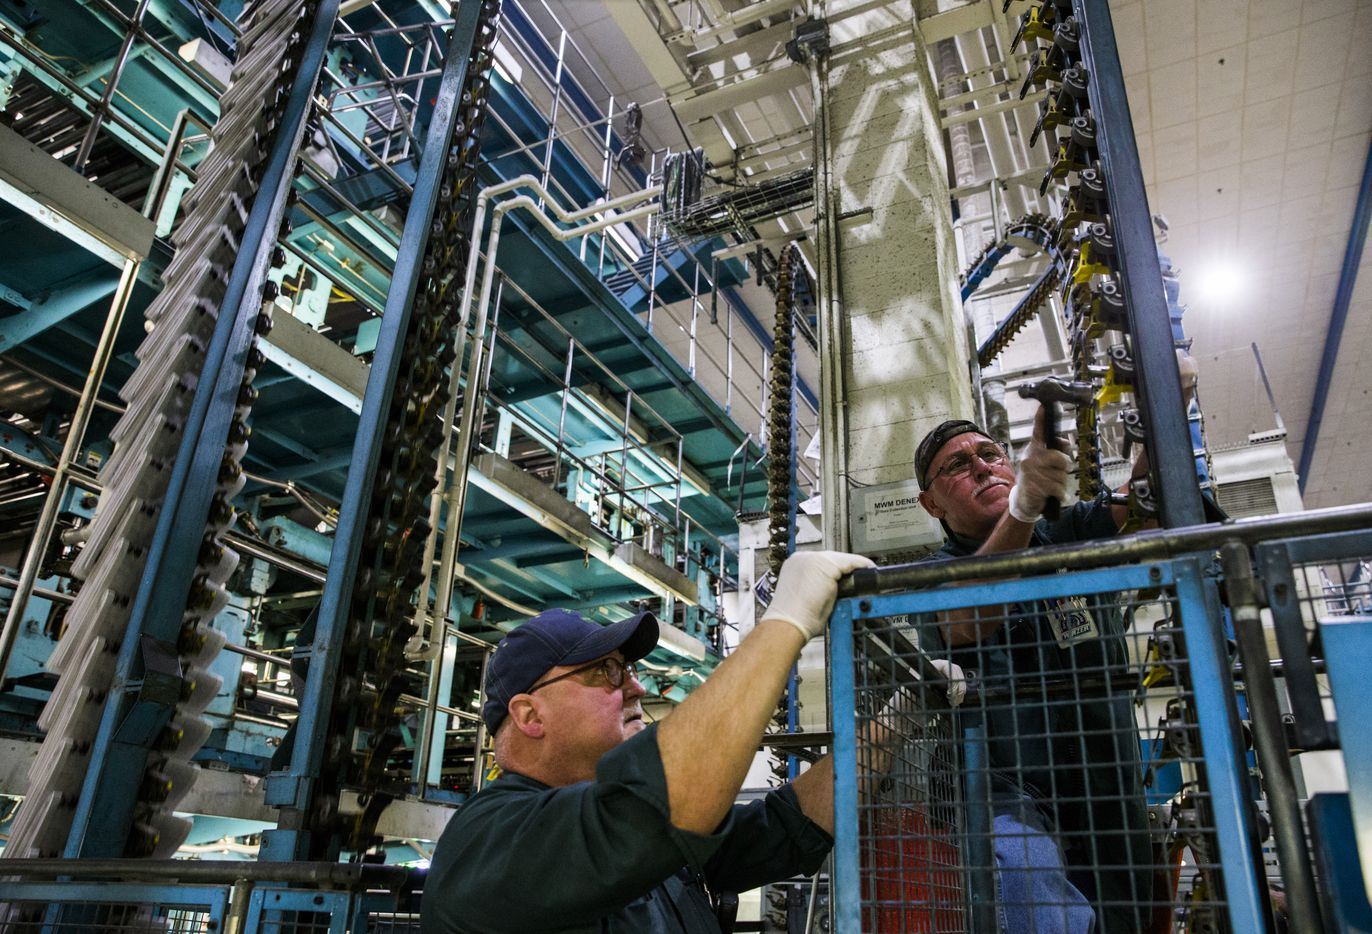 Joe Stockroom, left, and Hector Quinones do maintenance on a printing press. (Ashley Landis/The Dallas Morning News)